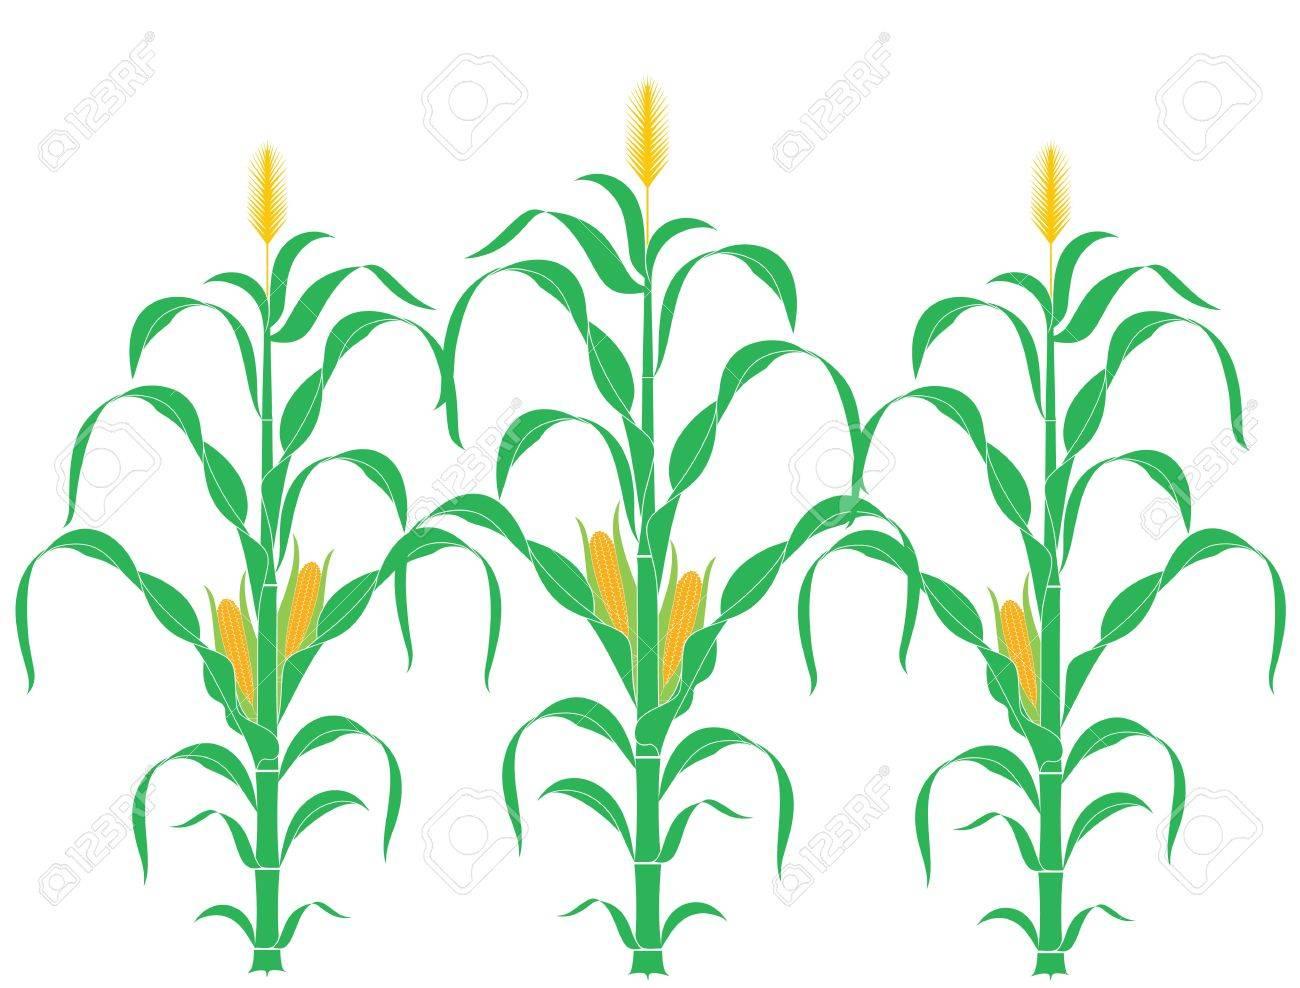 Corn Stalk. Corn.